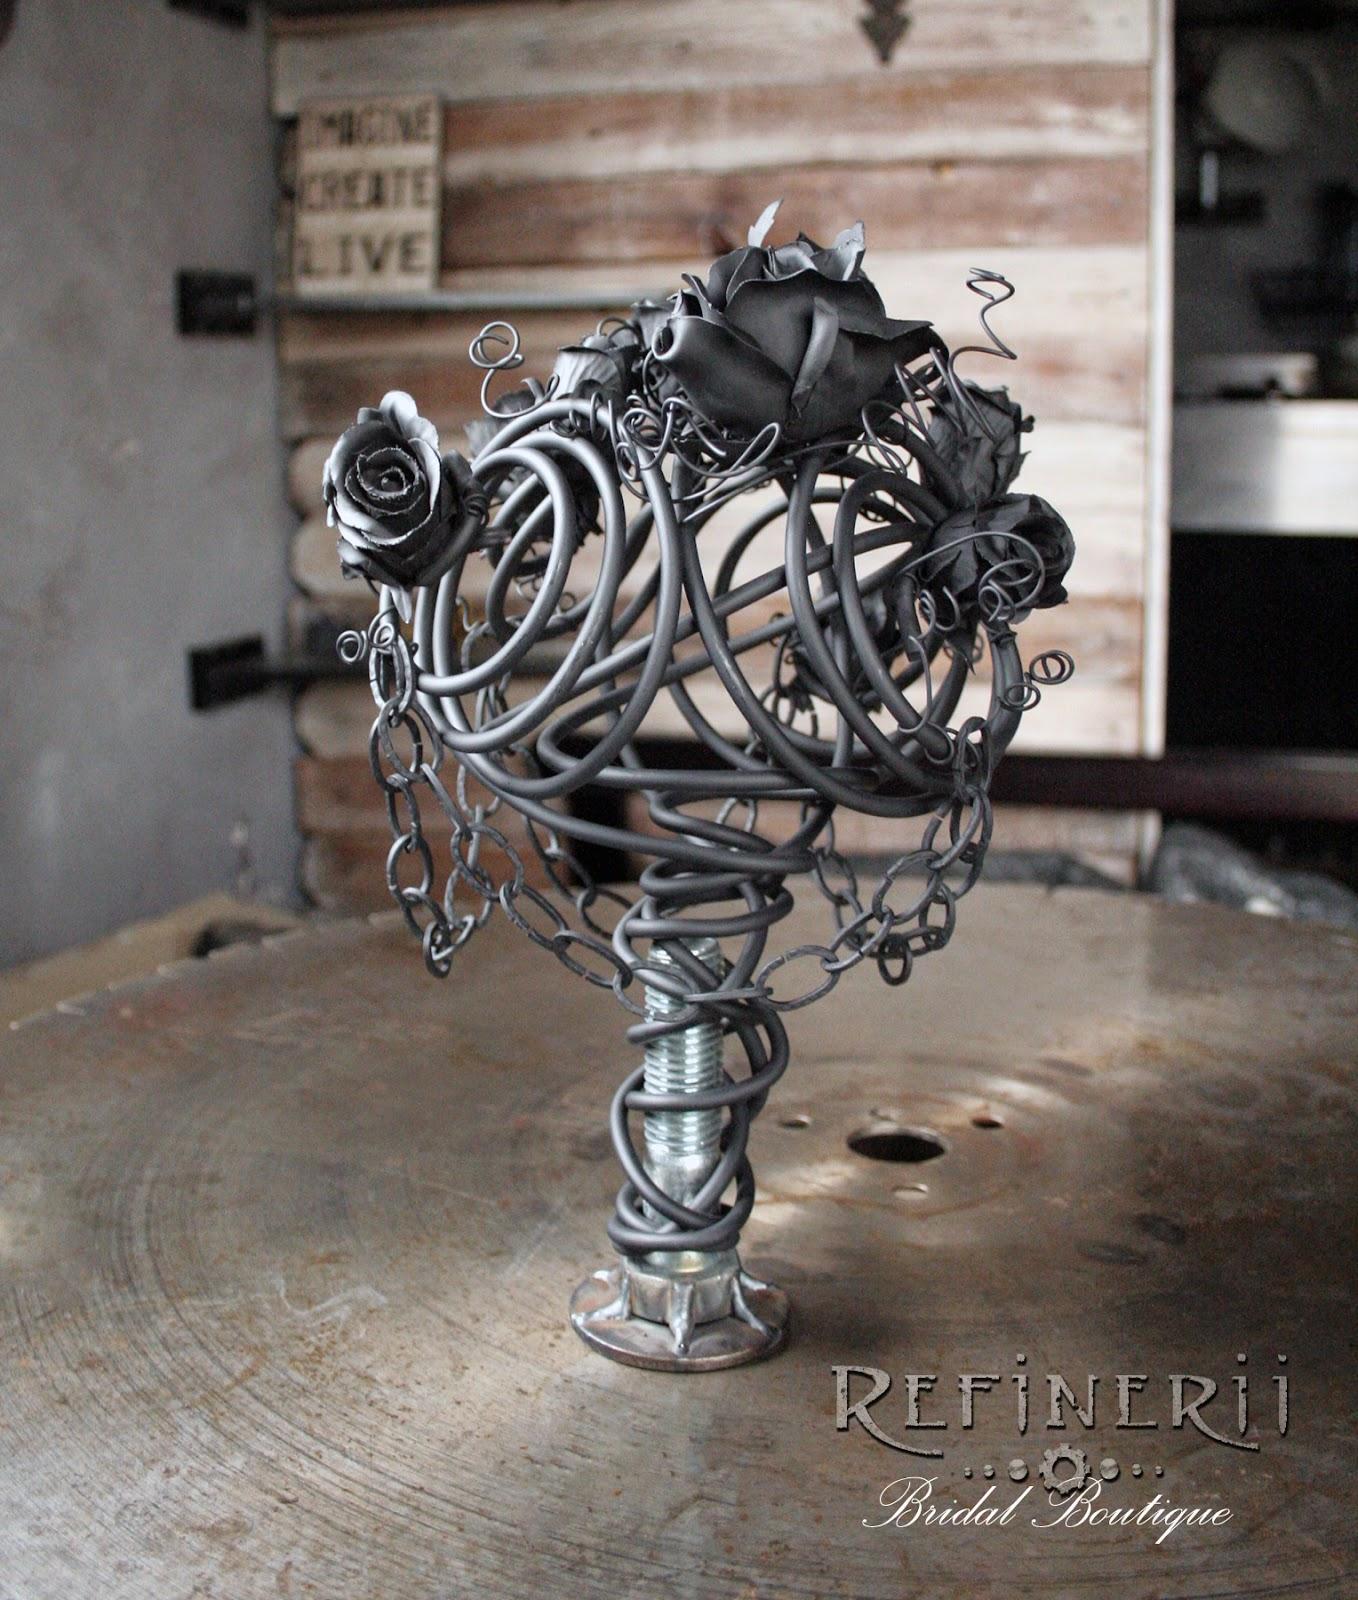 refinerii alternative metal bouquet goth black wedding roses perpetual